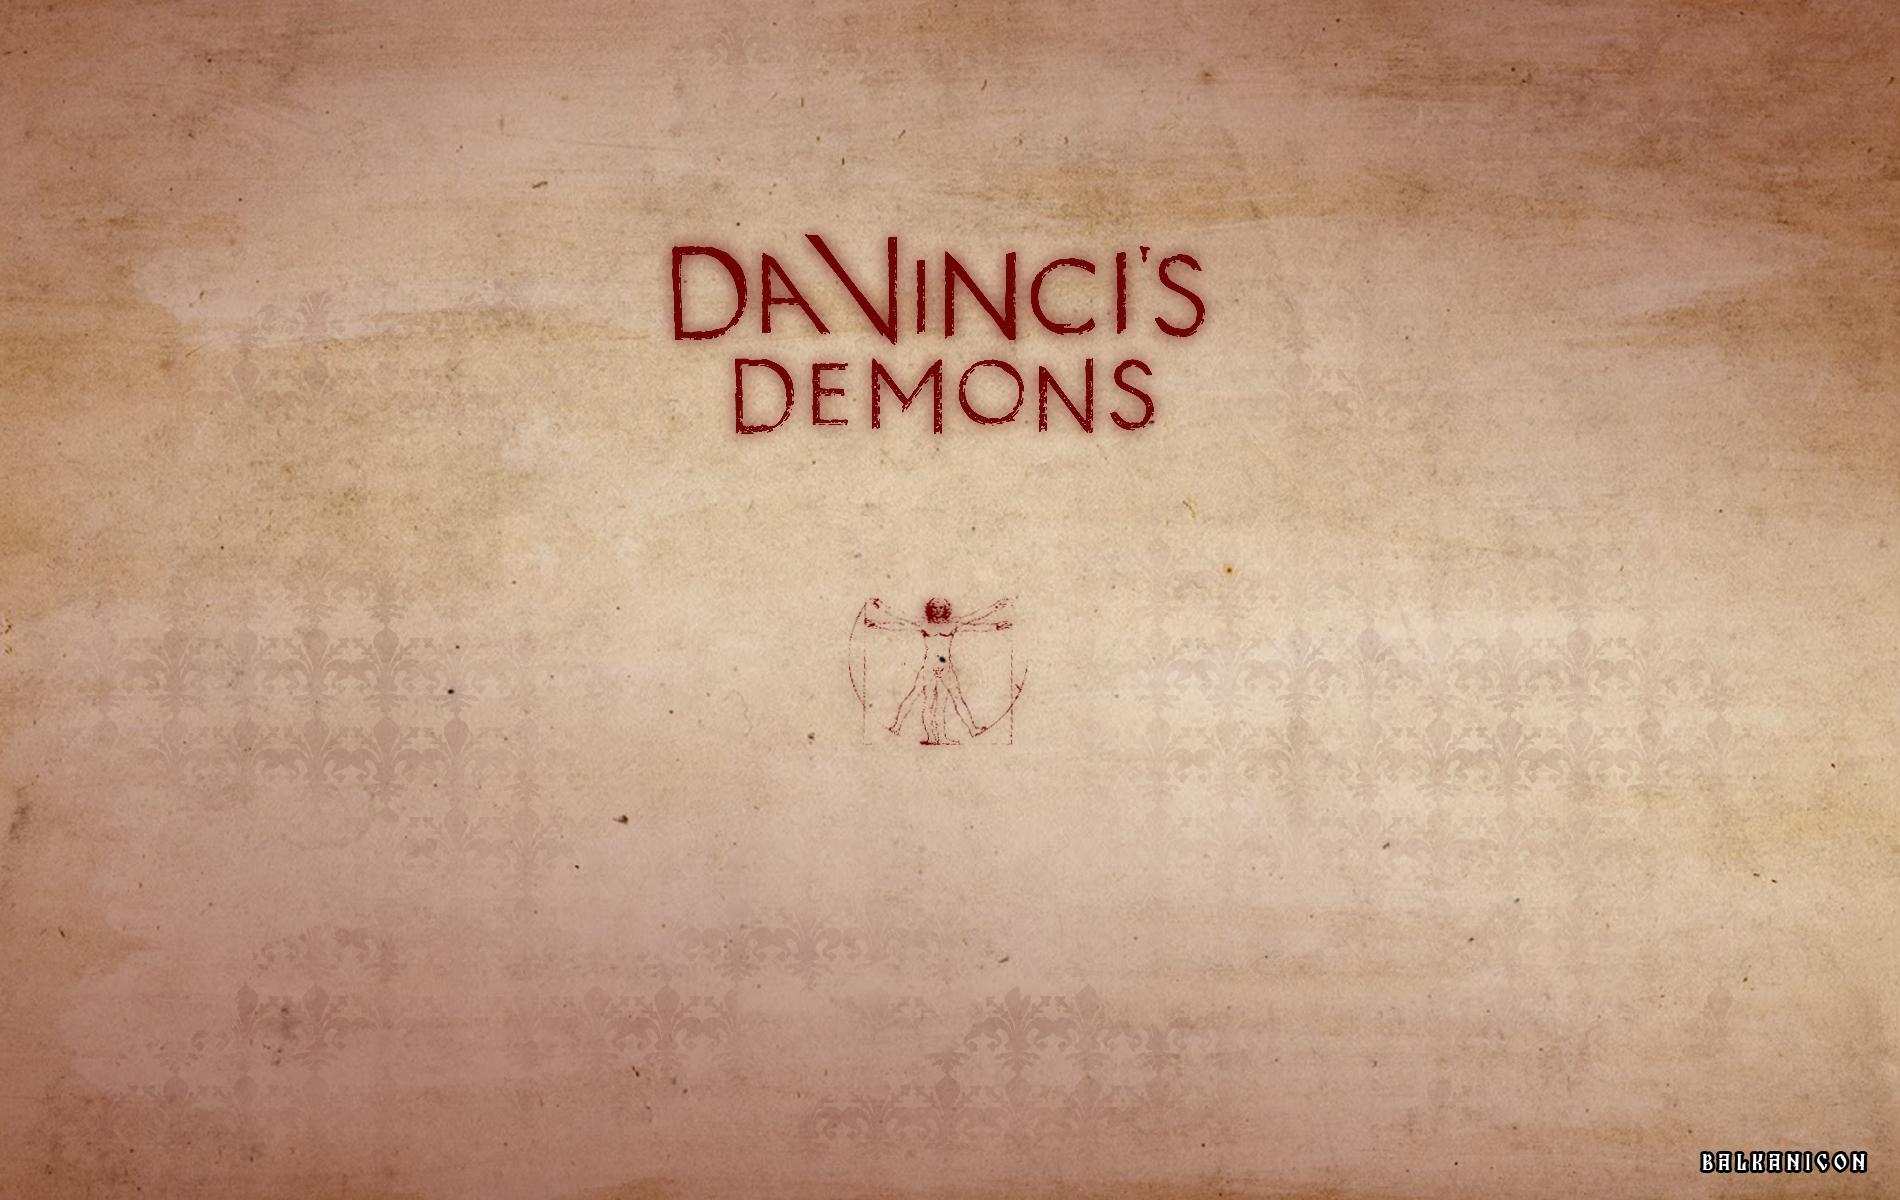 Da Vinci's Demons Wallpaper By Balkanicon On DeviantArt